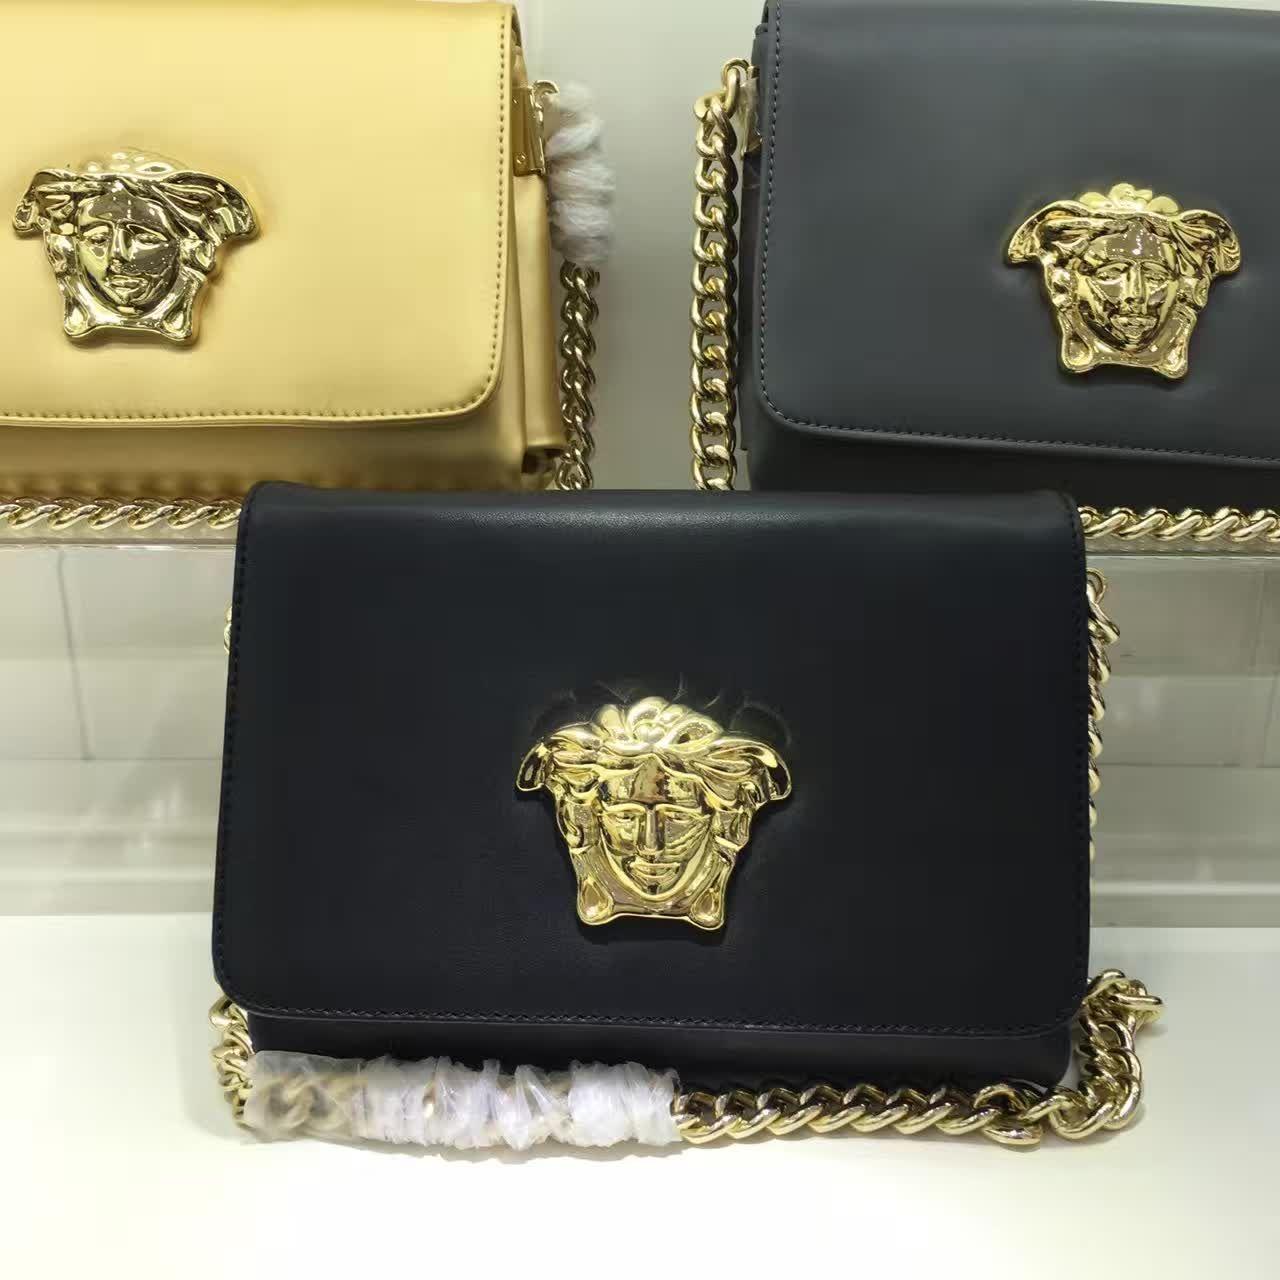 Versace Clutch Id 63994 Forsale A Yybags Com Versace Backpacks For Men Versace Handbag Sale Wallets For Women Leather Versace Purses Black Designer Bags